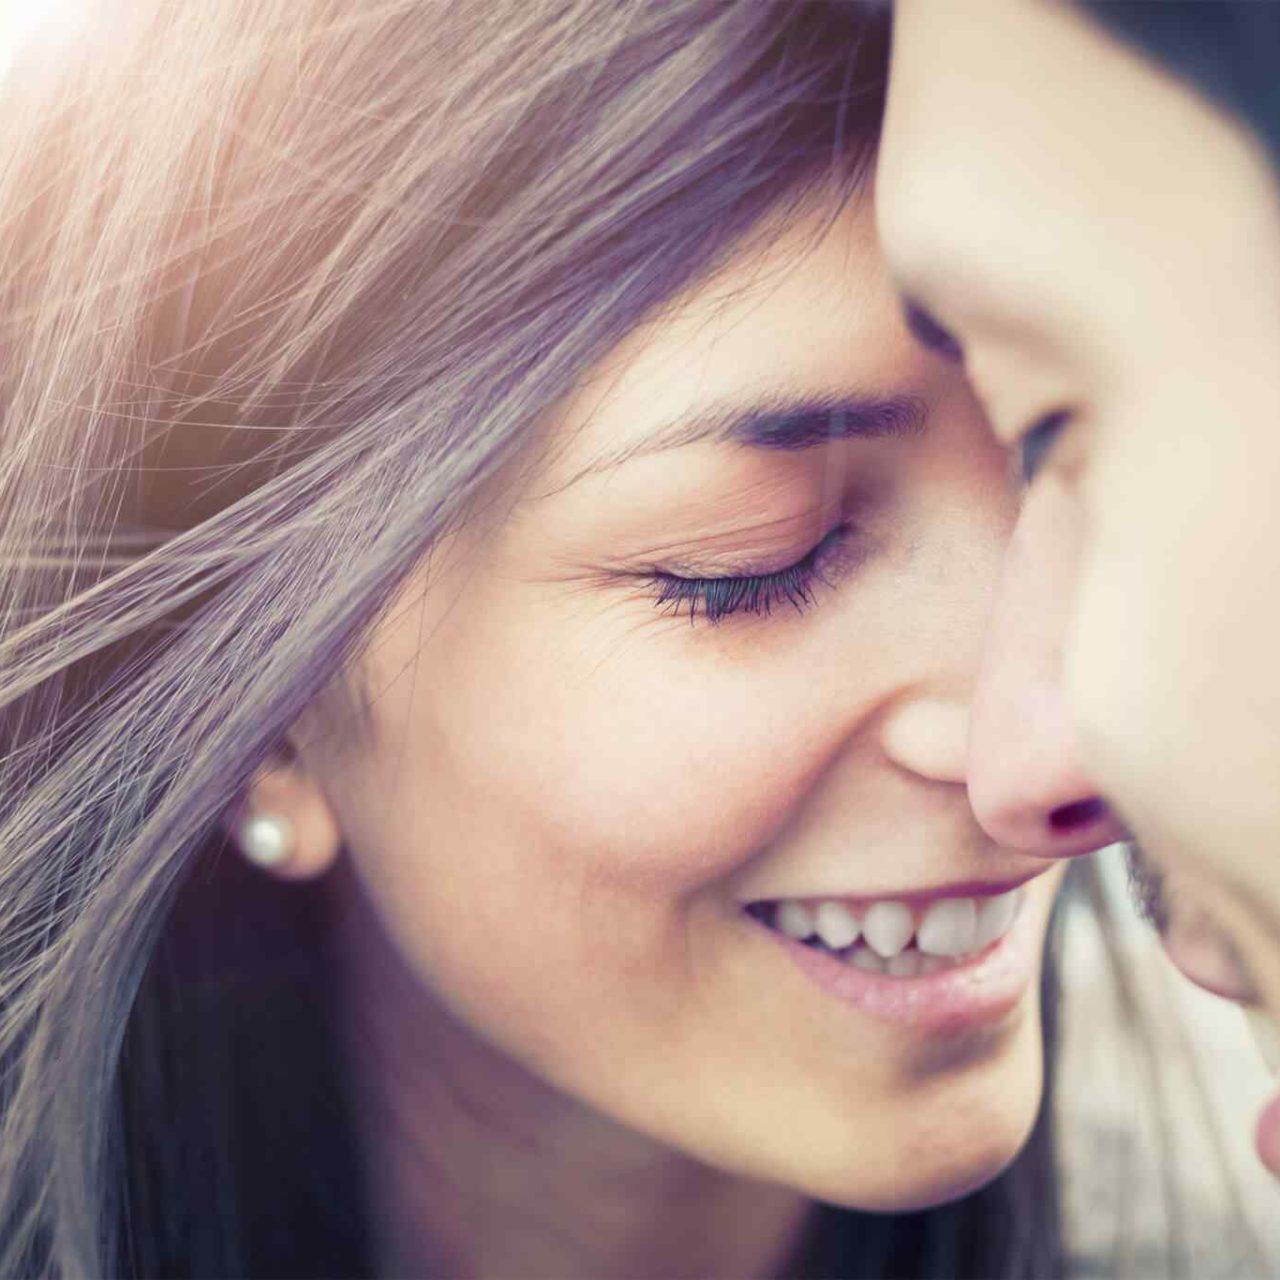 https://loenne.info/wp-content/uploads/2018/01/img-class-marriage-01-1280x1280.jpg